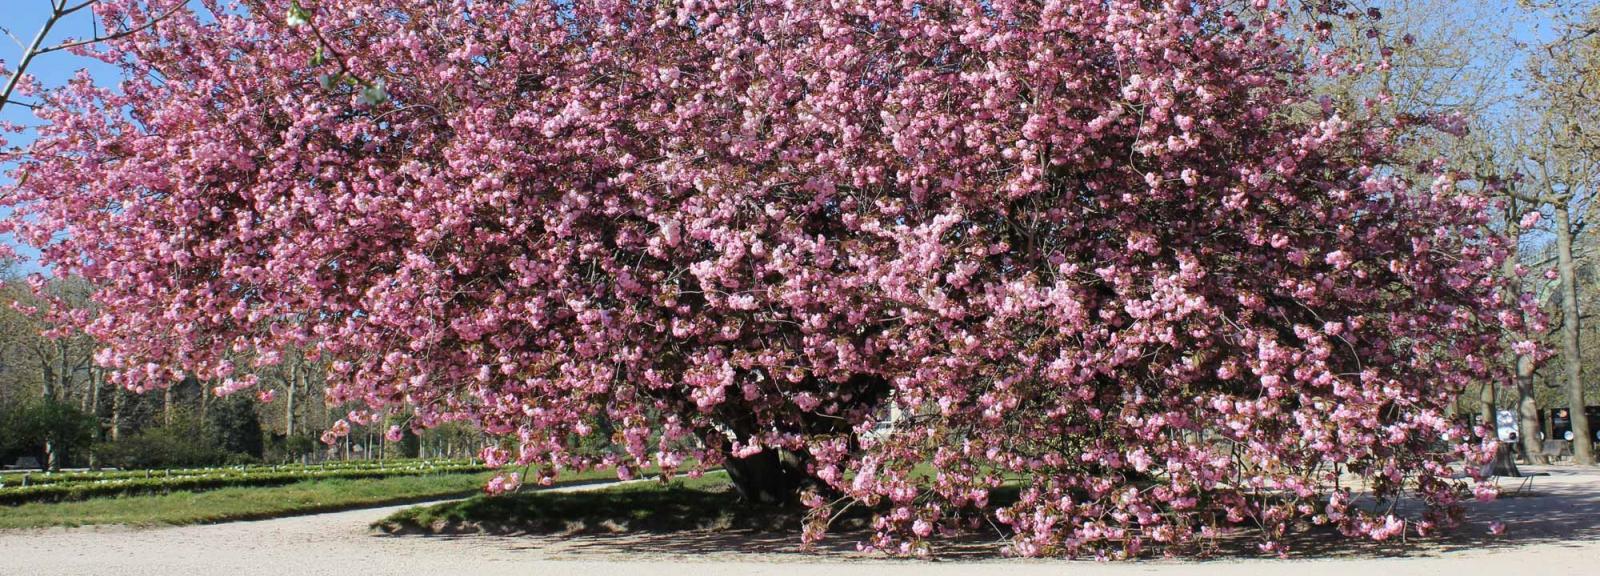 Prunus « Kanzan » en fleurs au Jardin des Plantes © MNHN - Xavier Riffet